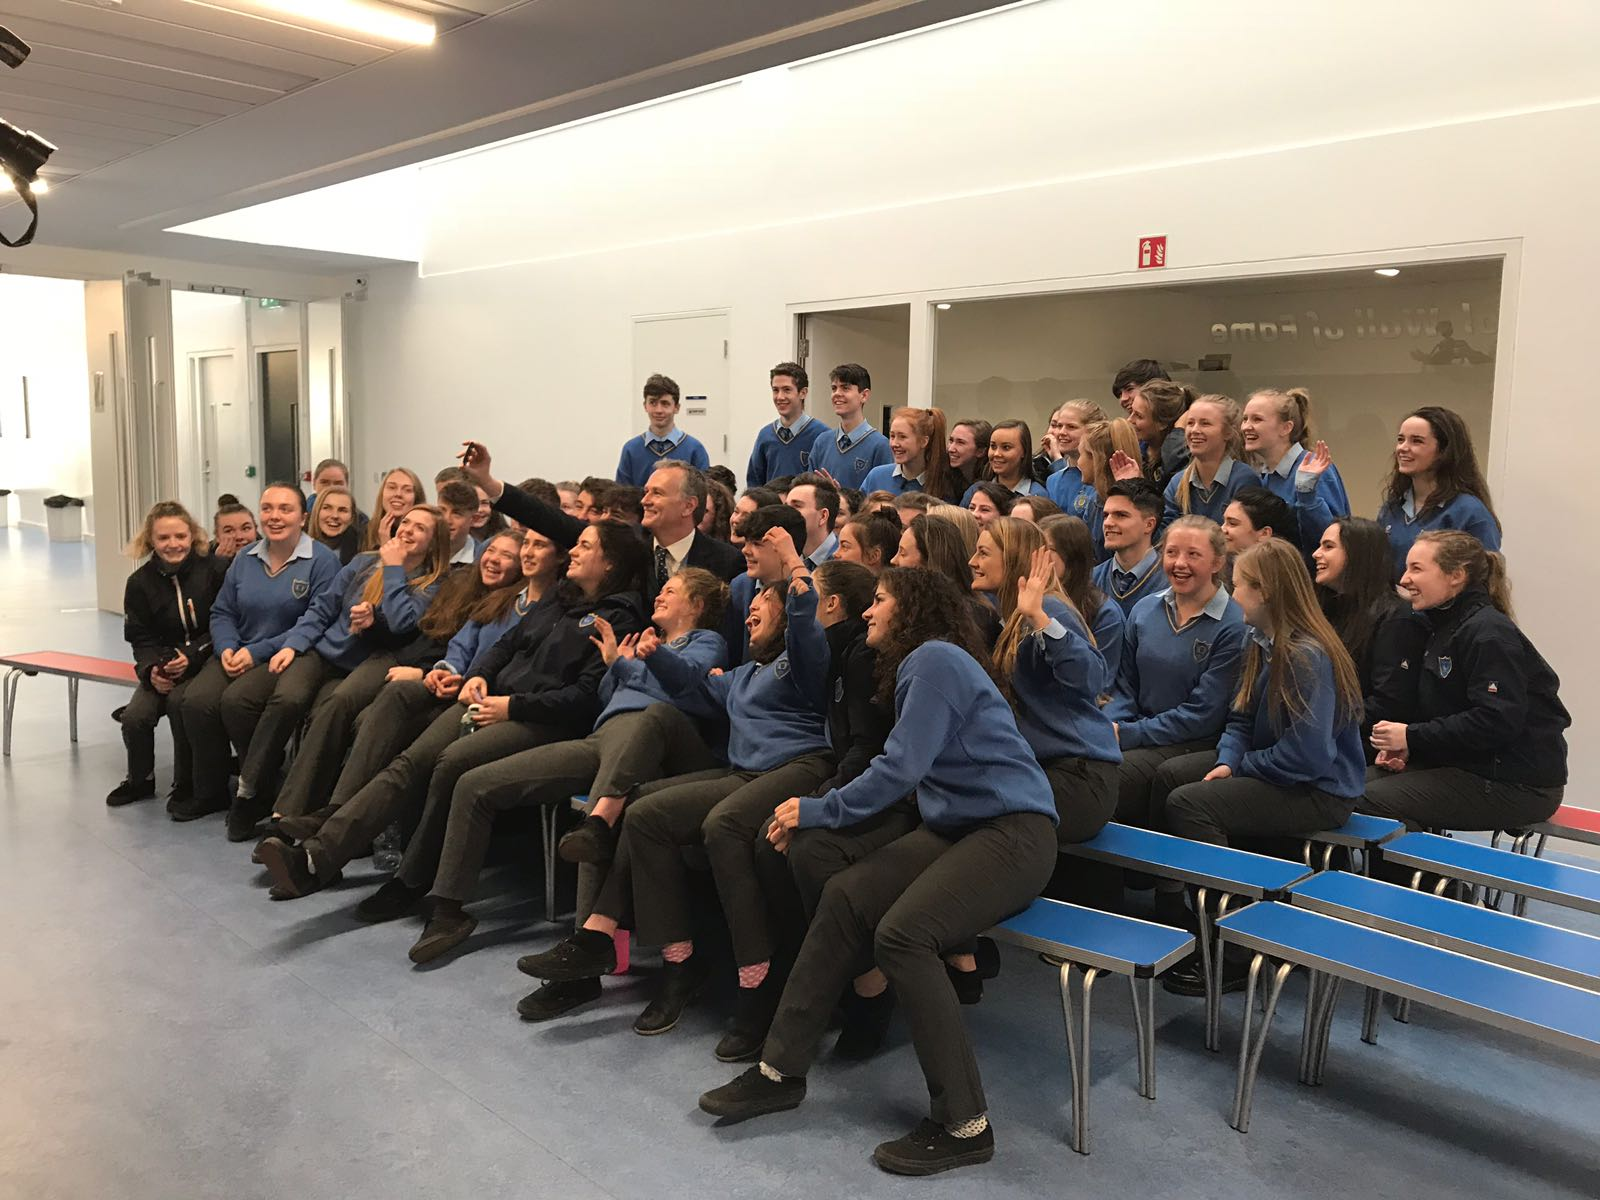 Skibbereen, Ireland Health Events | Eventbrite